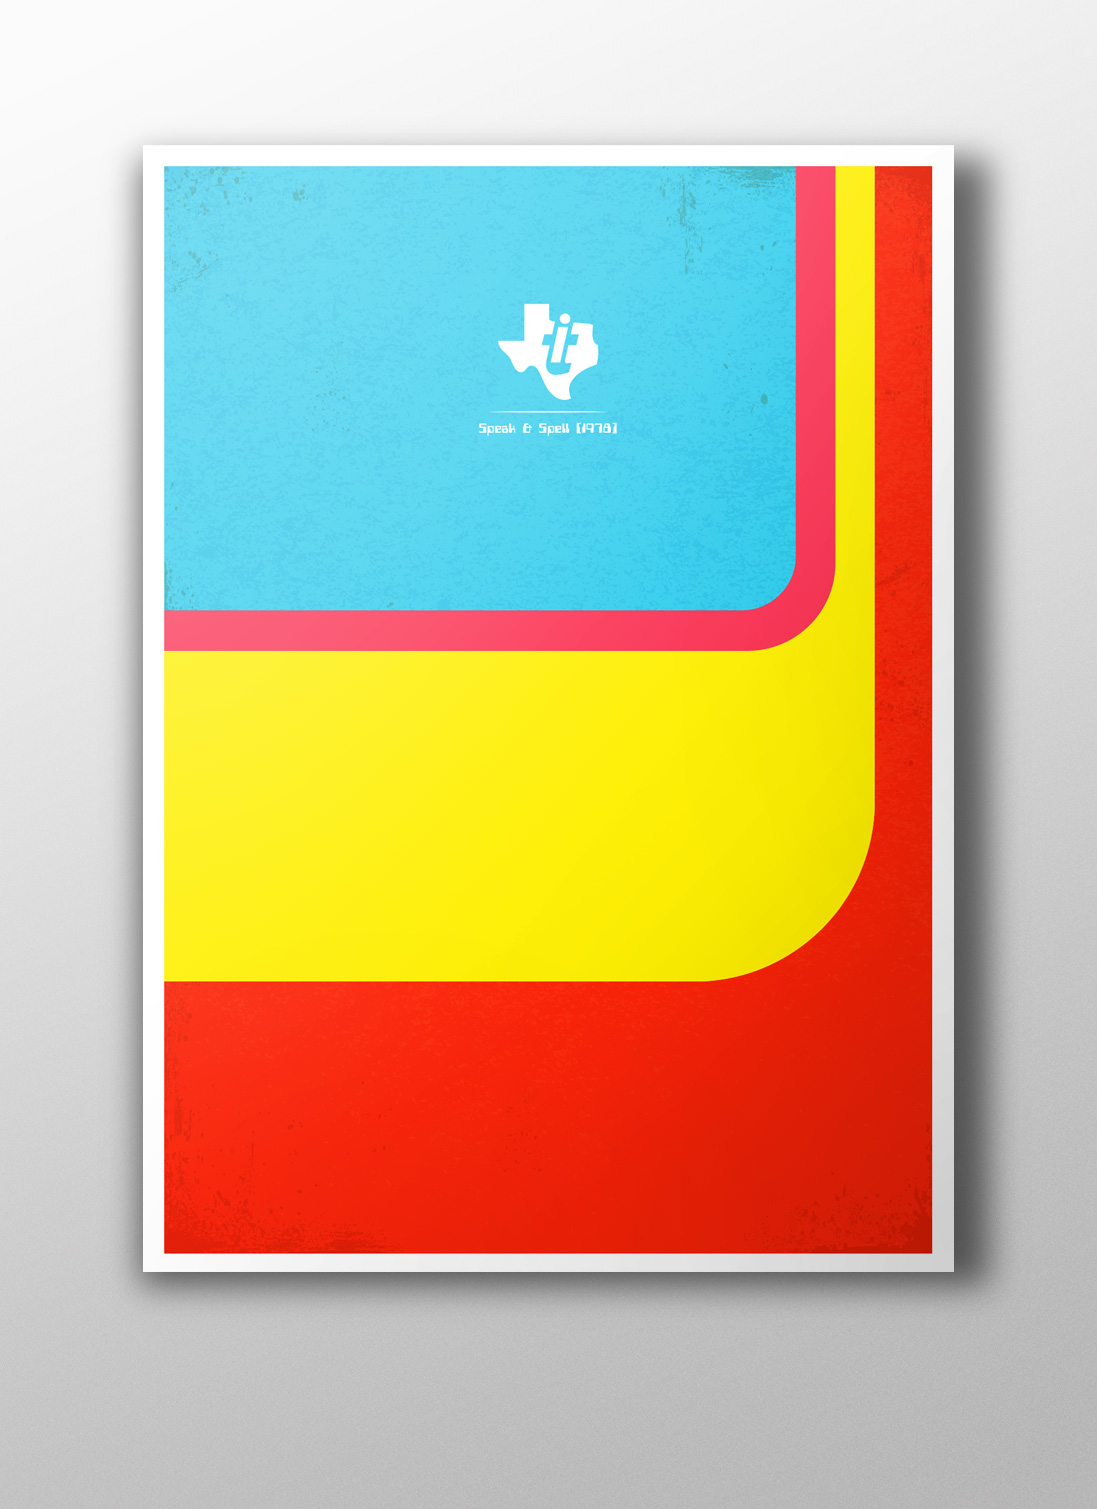 Speak & Spell Minimalist Poster